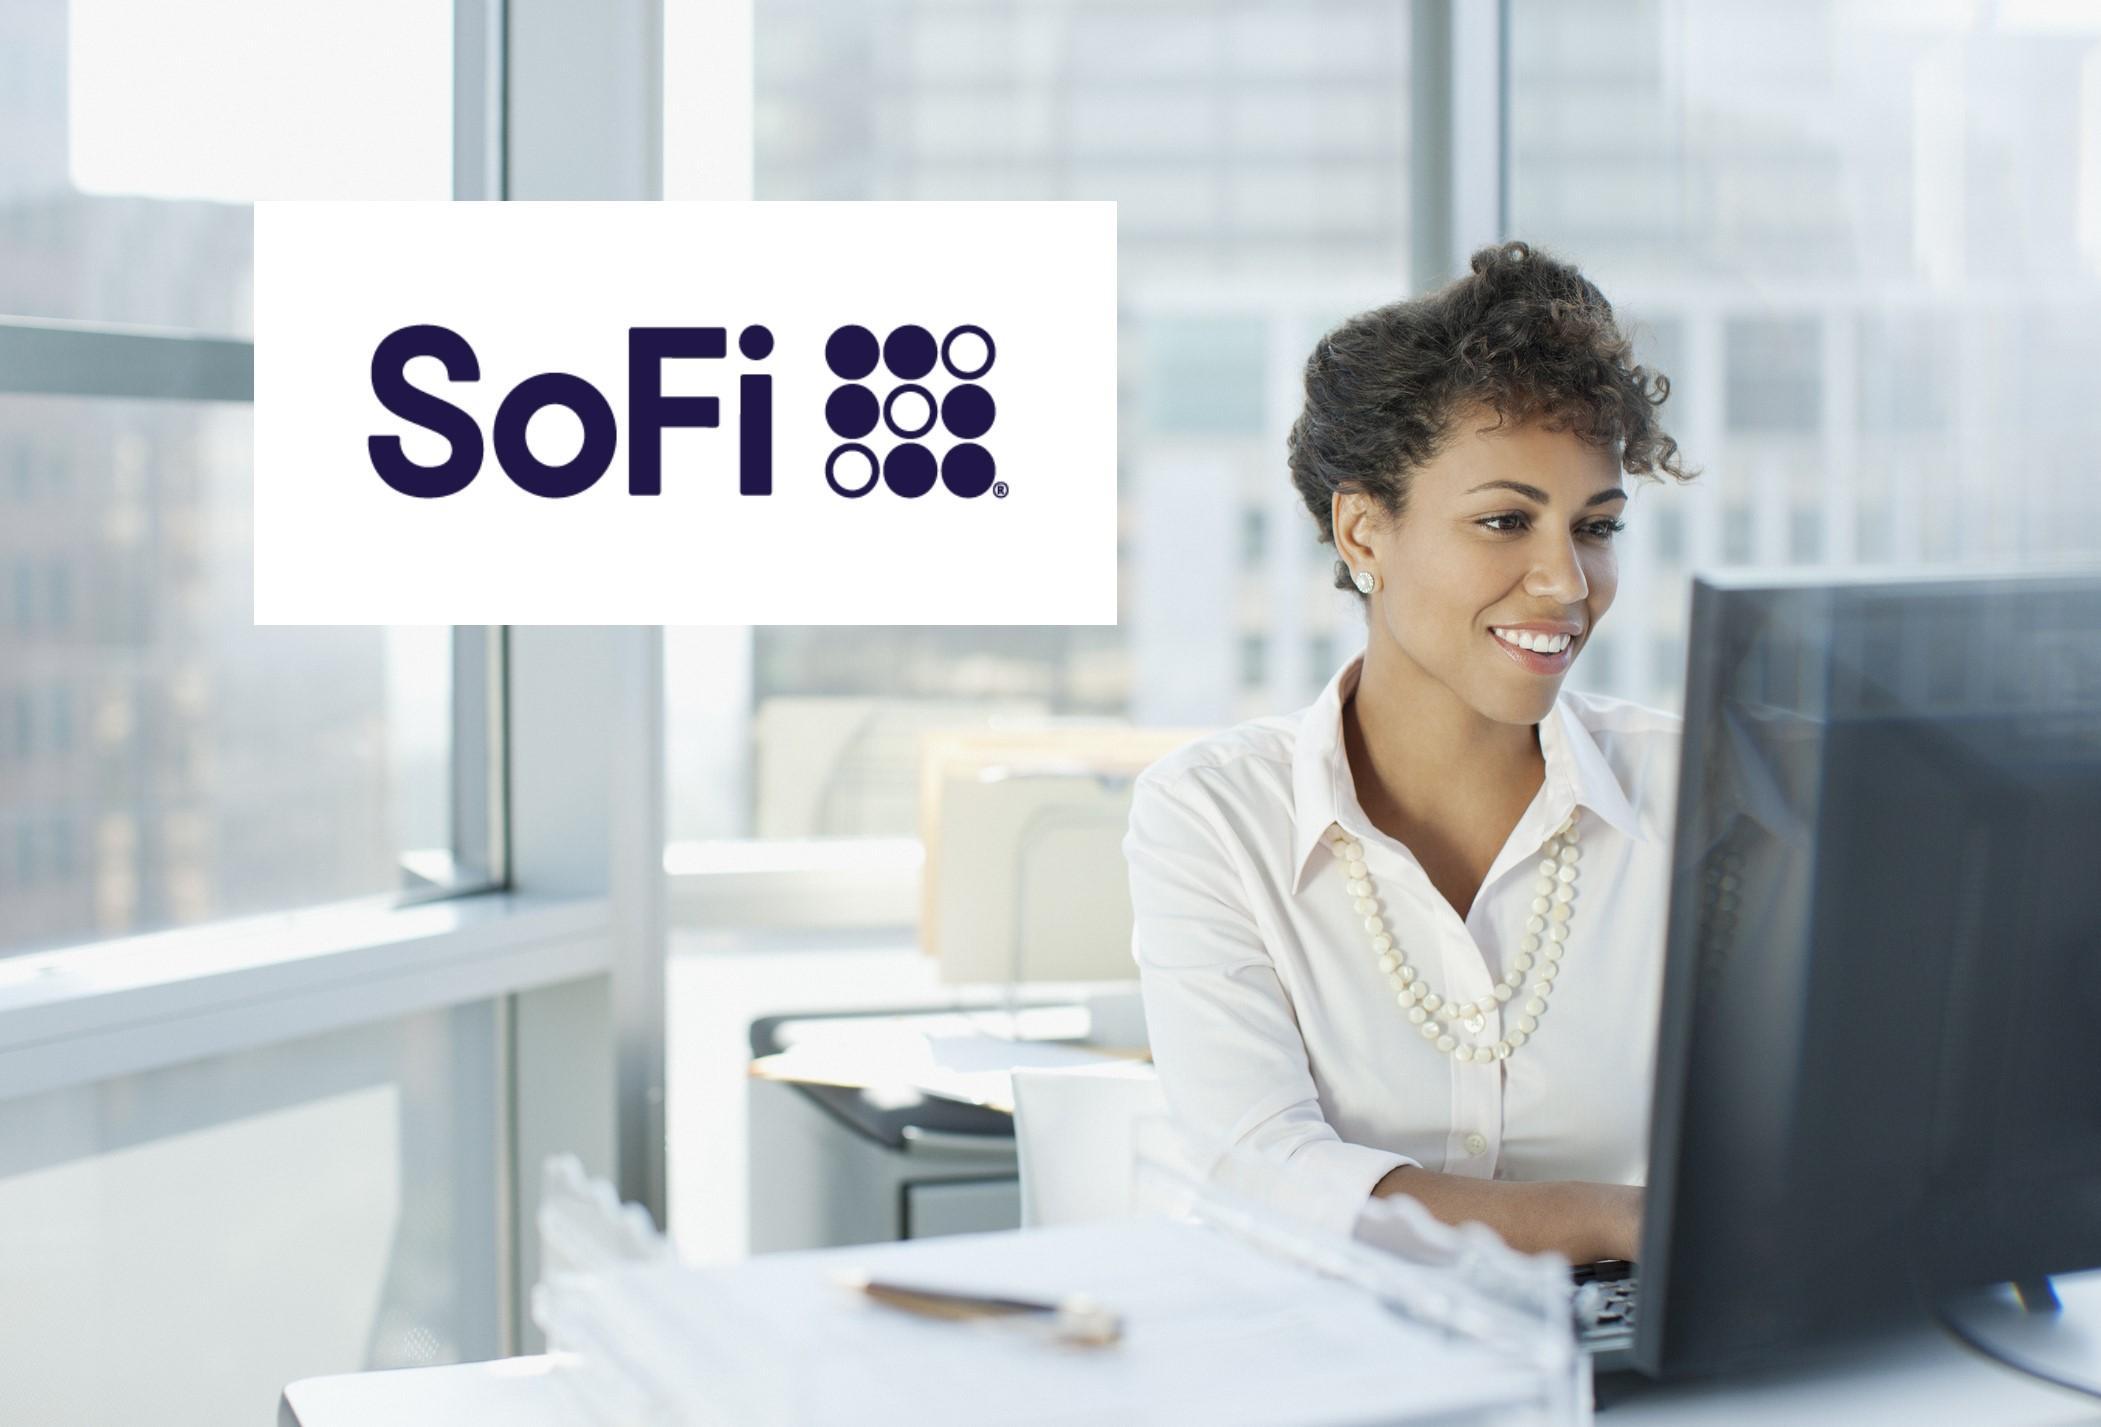 SoFi logo over woman working on computer